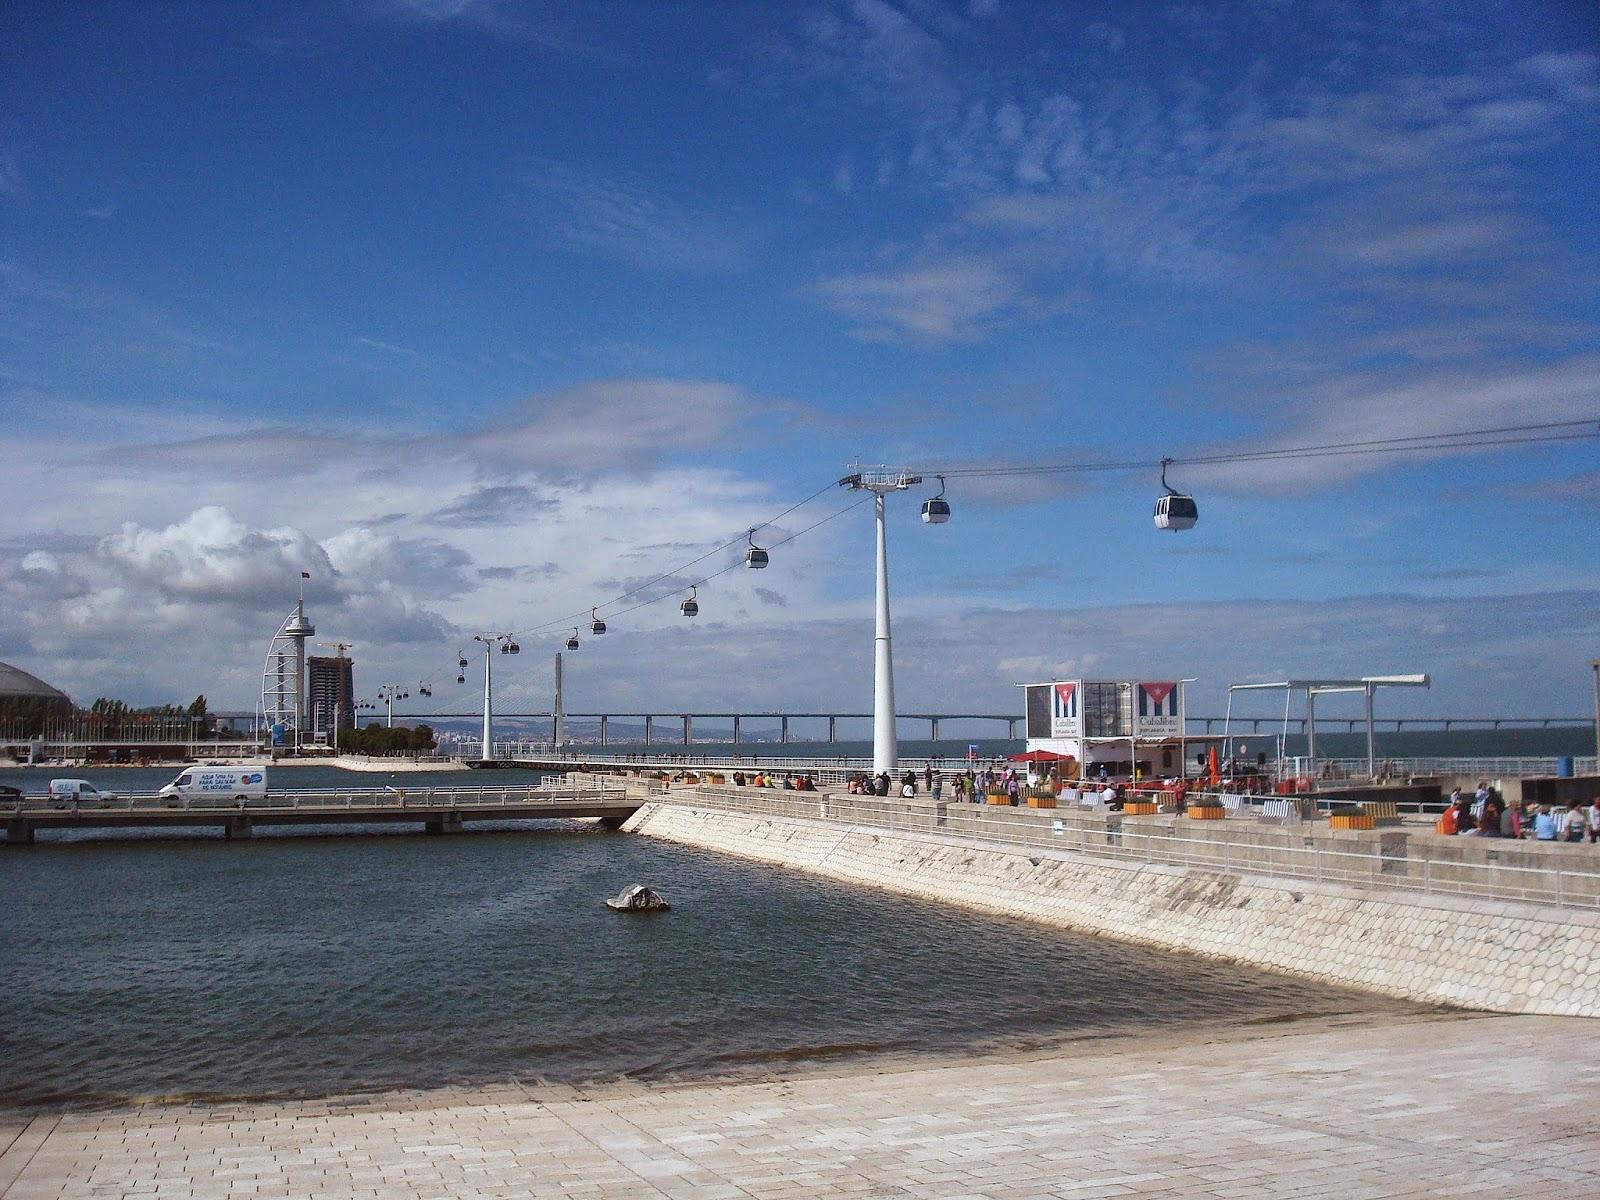 Torre Vasco de Gama and Cable Cars to the Oceanarium, Lisbon, Portugal